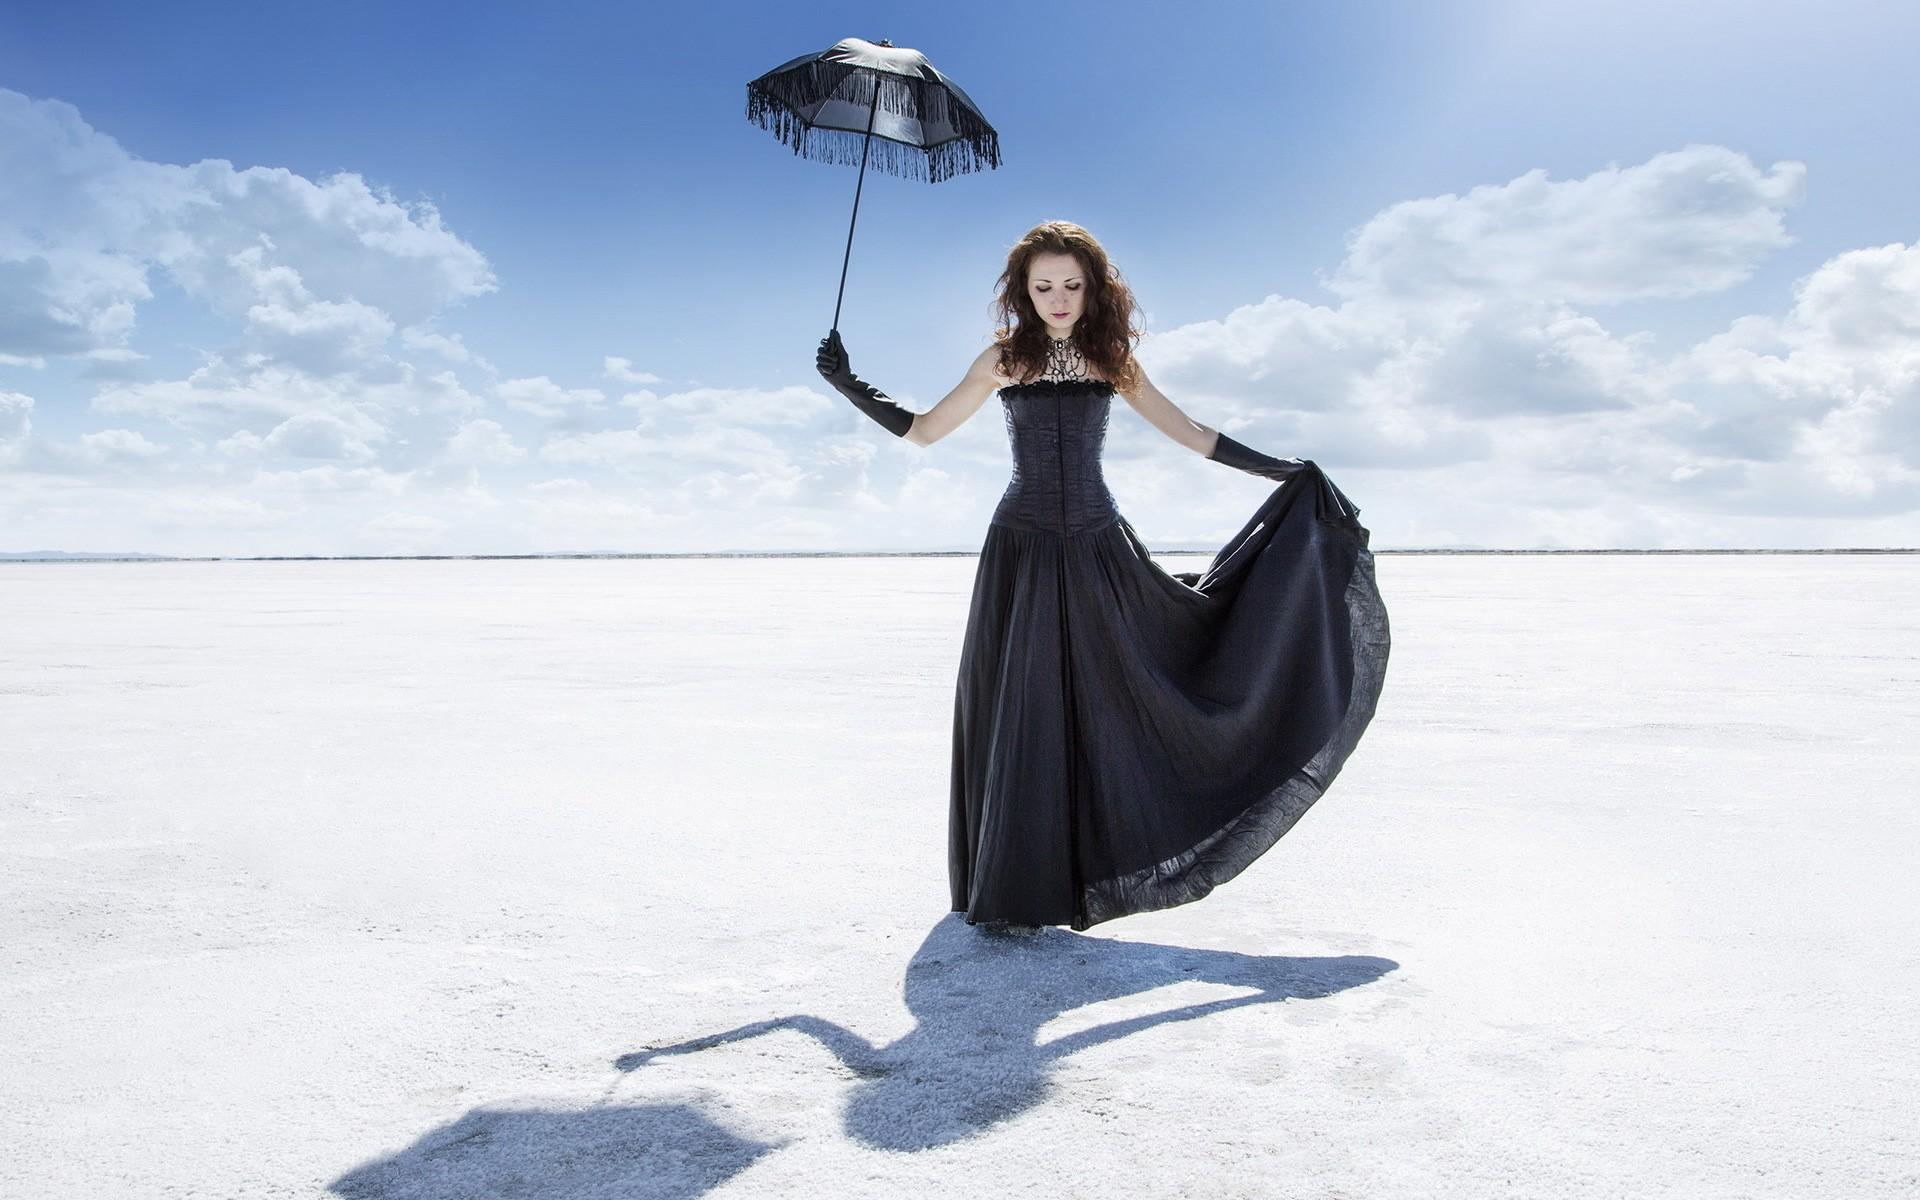 Girl Black Dress Umbrella, Hd Photography, 4K Wallpapers, Images, Backgrounds, Photos -1864